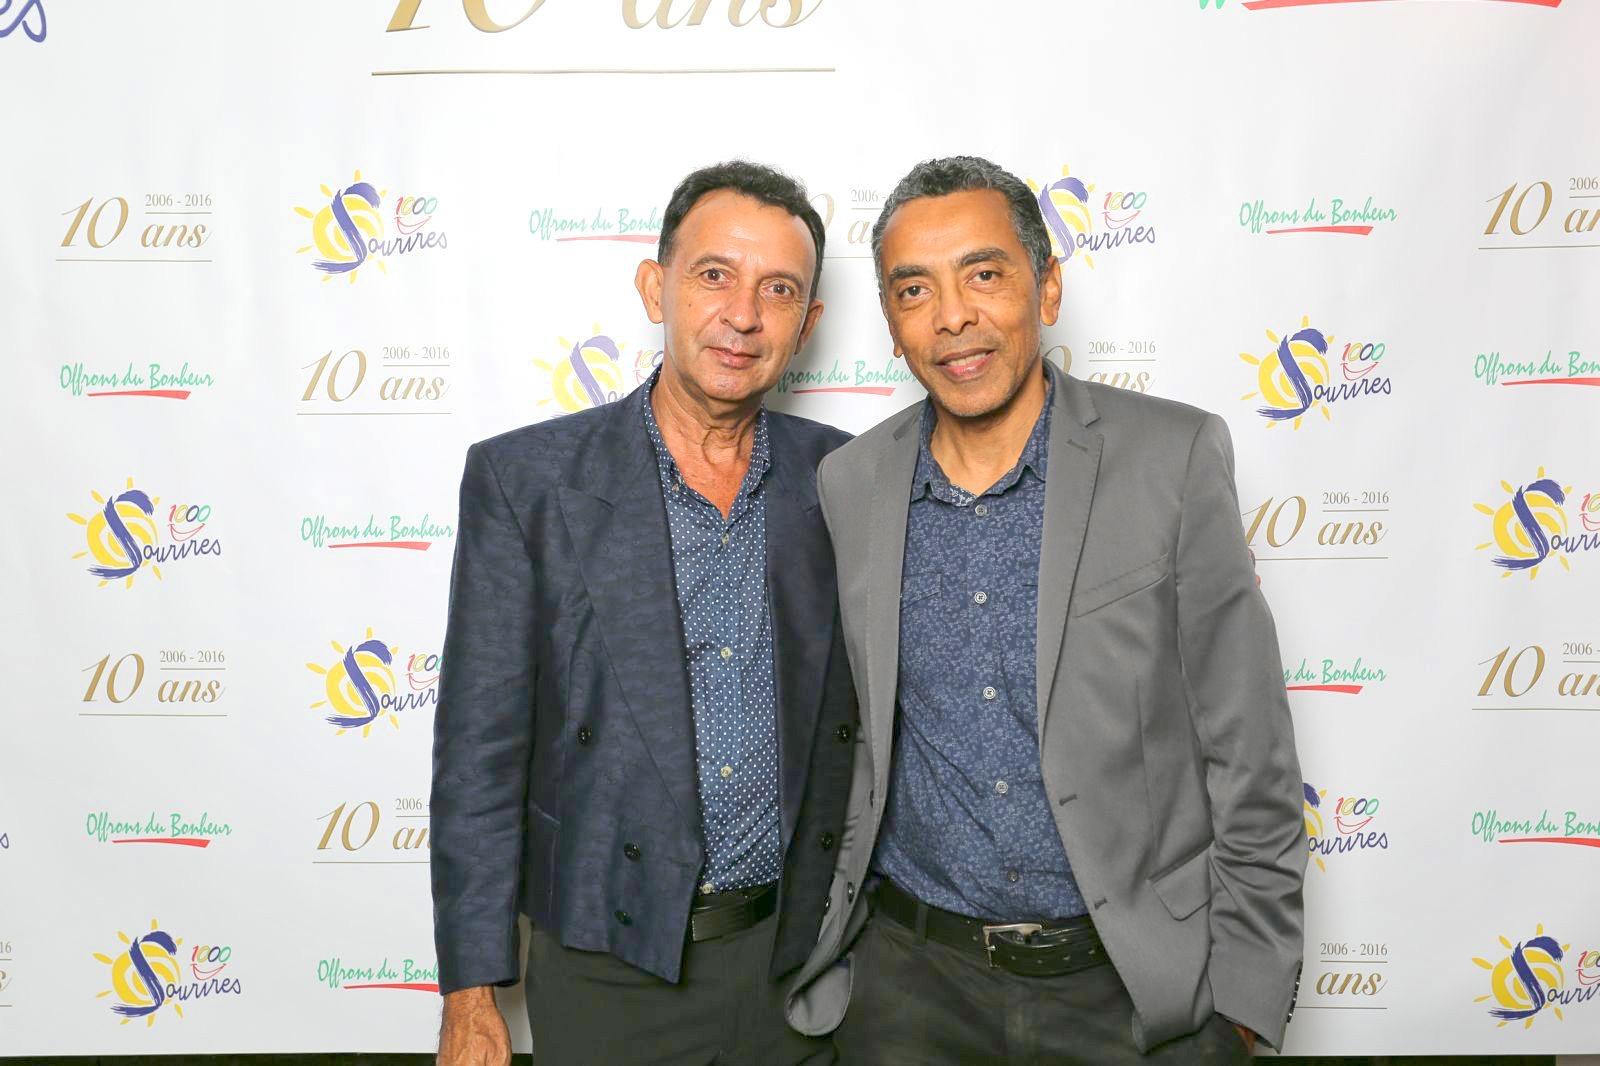 André Gigant et Thierry Jardinot